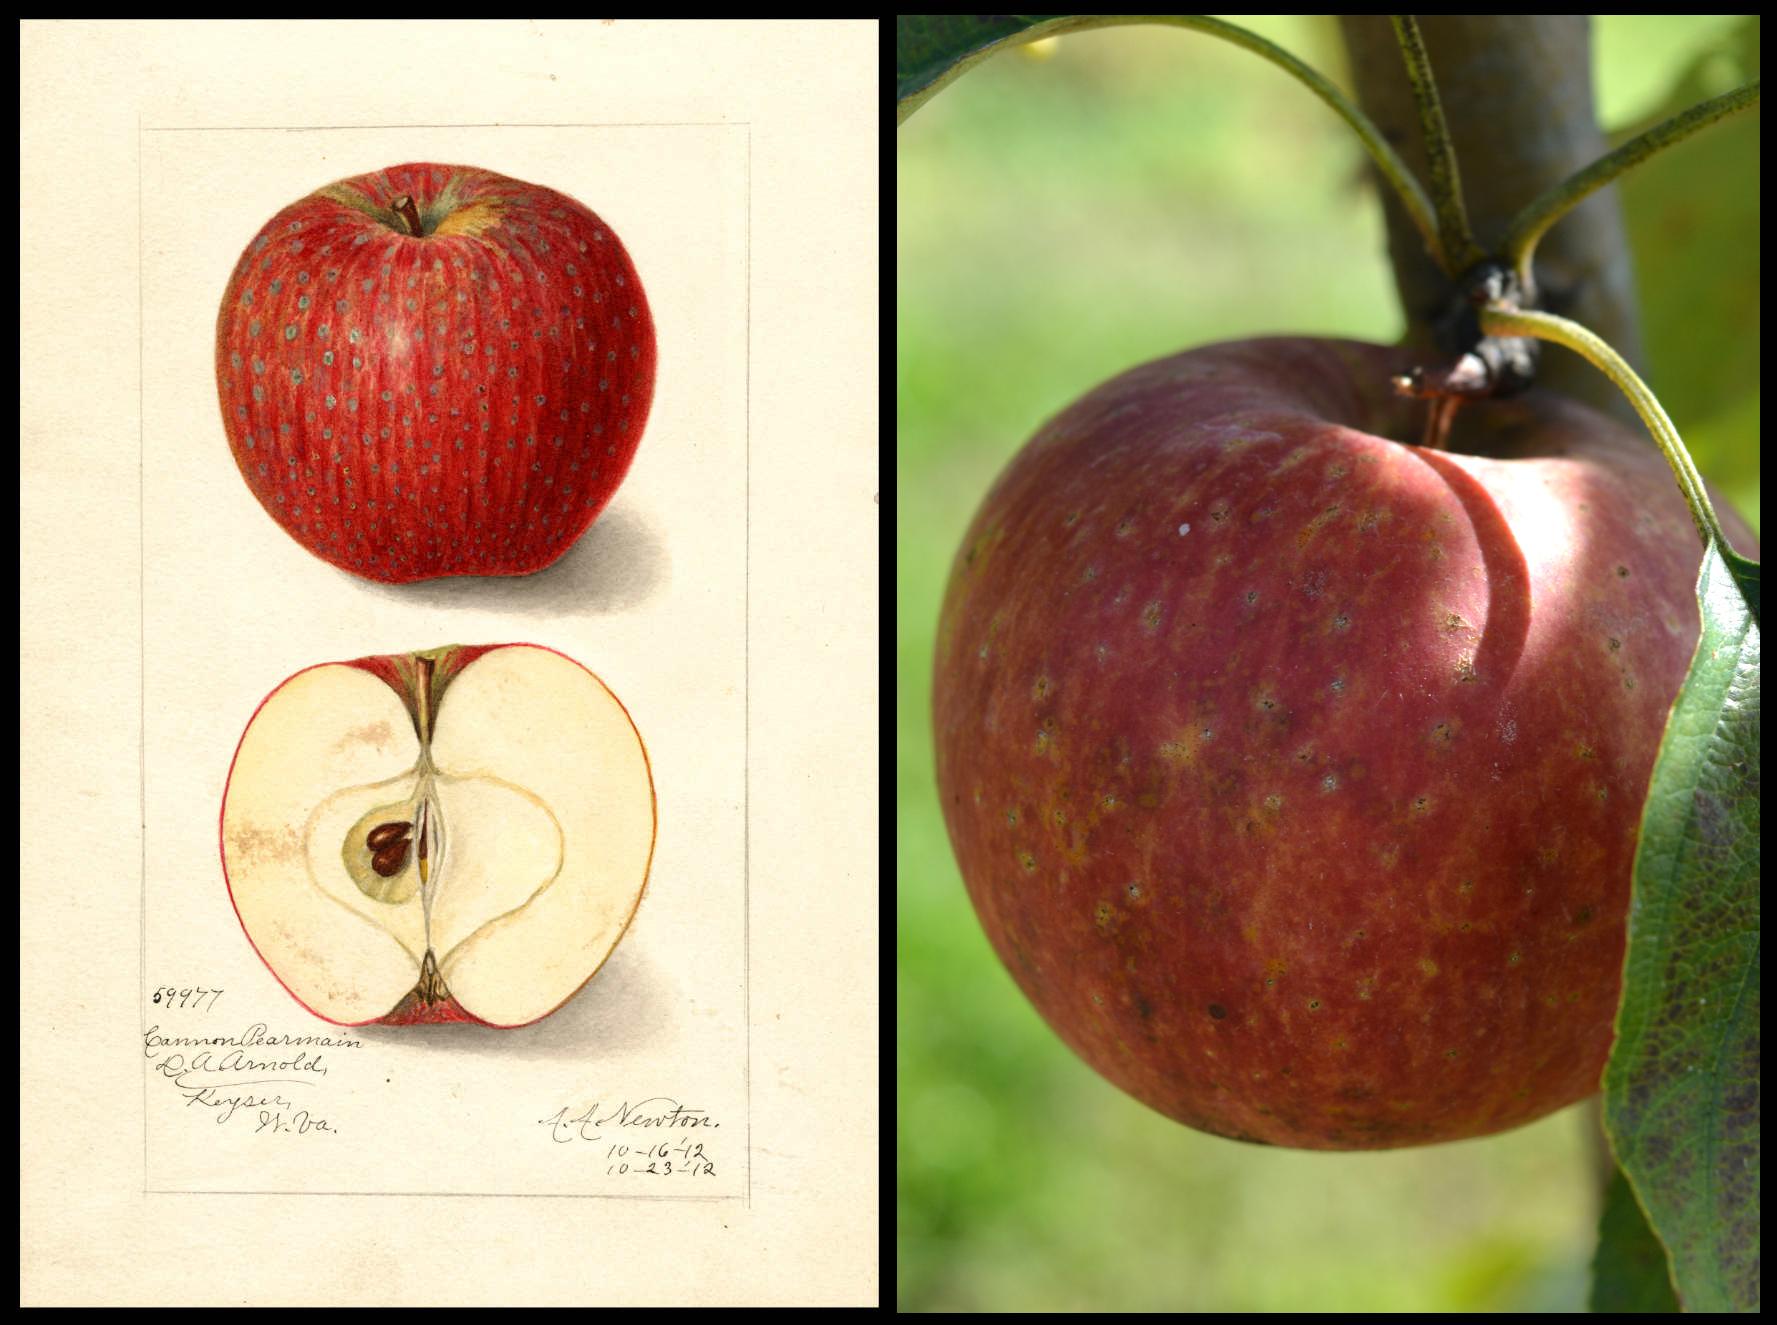 mottled dark and light red apple with lighter spots